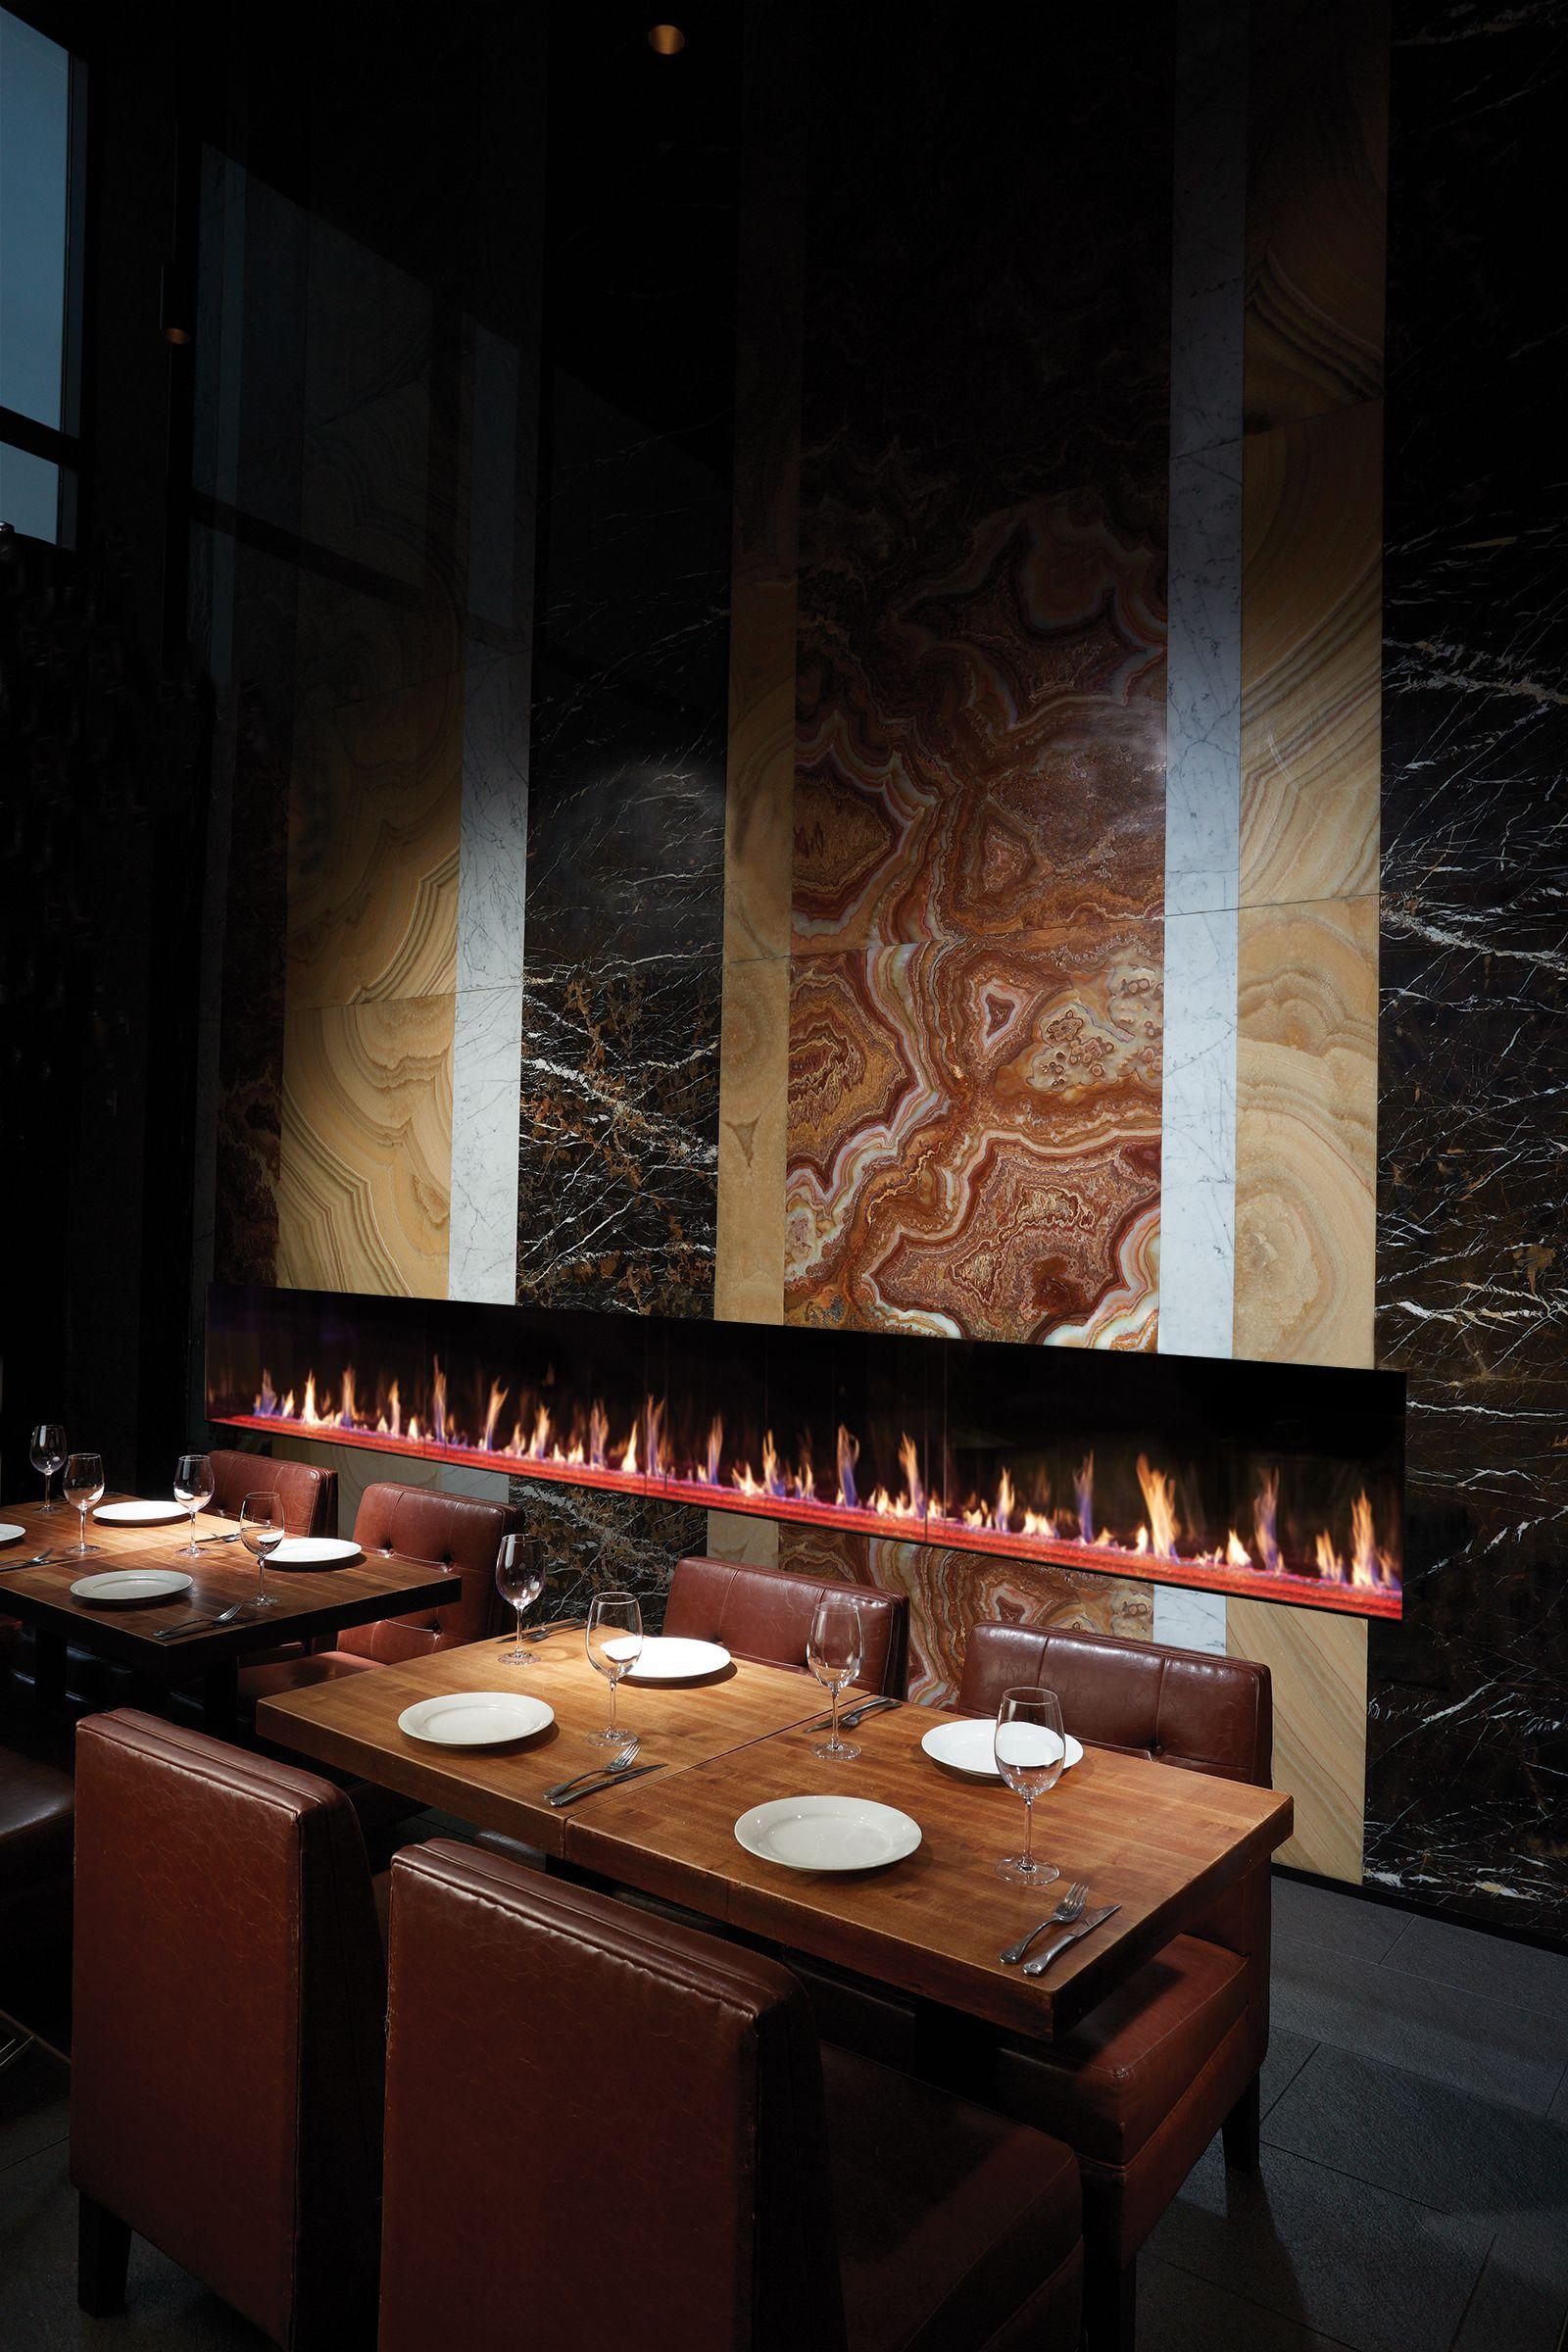 Modern Linear Fireplace For Restaurant Fireplace Gallery Linear Fireplace Fireplace Design